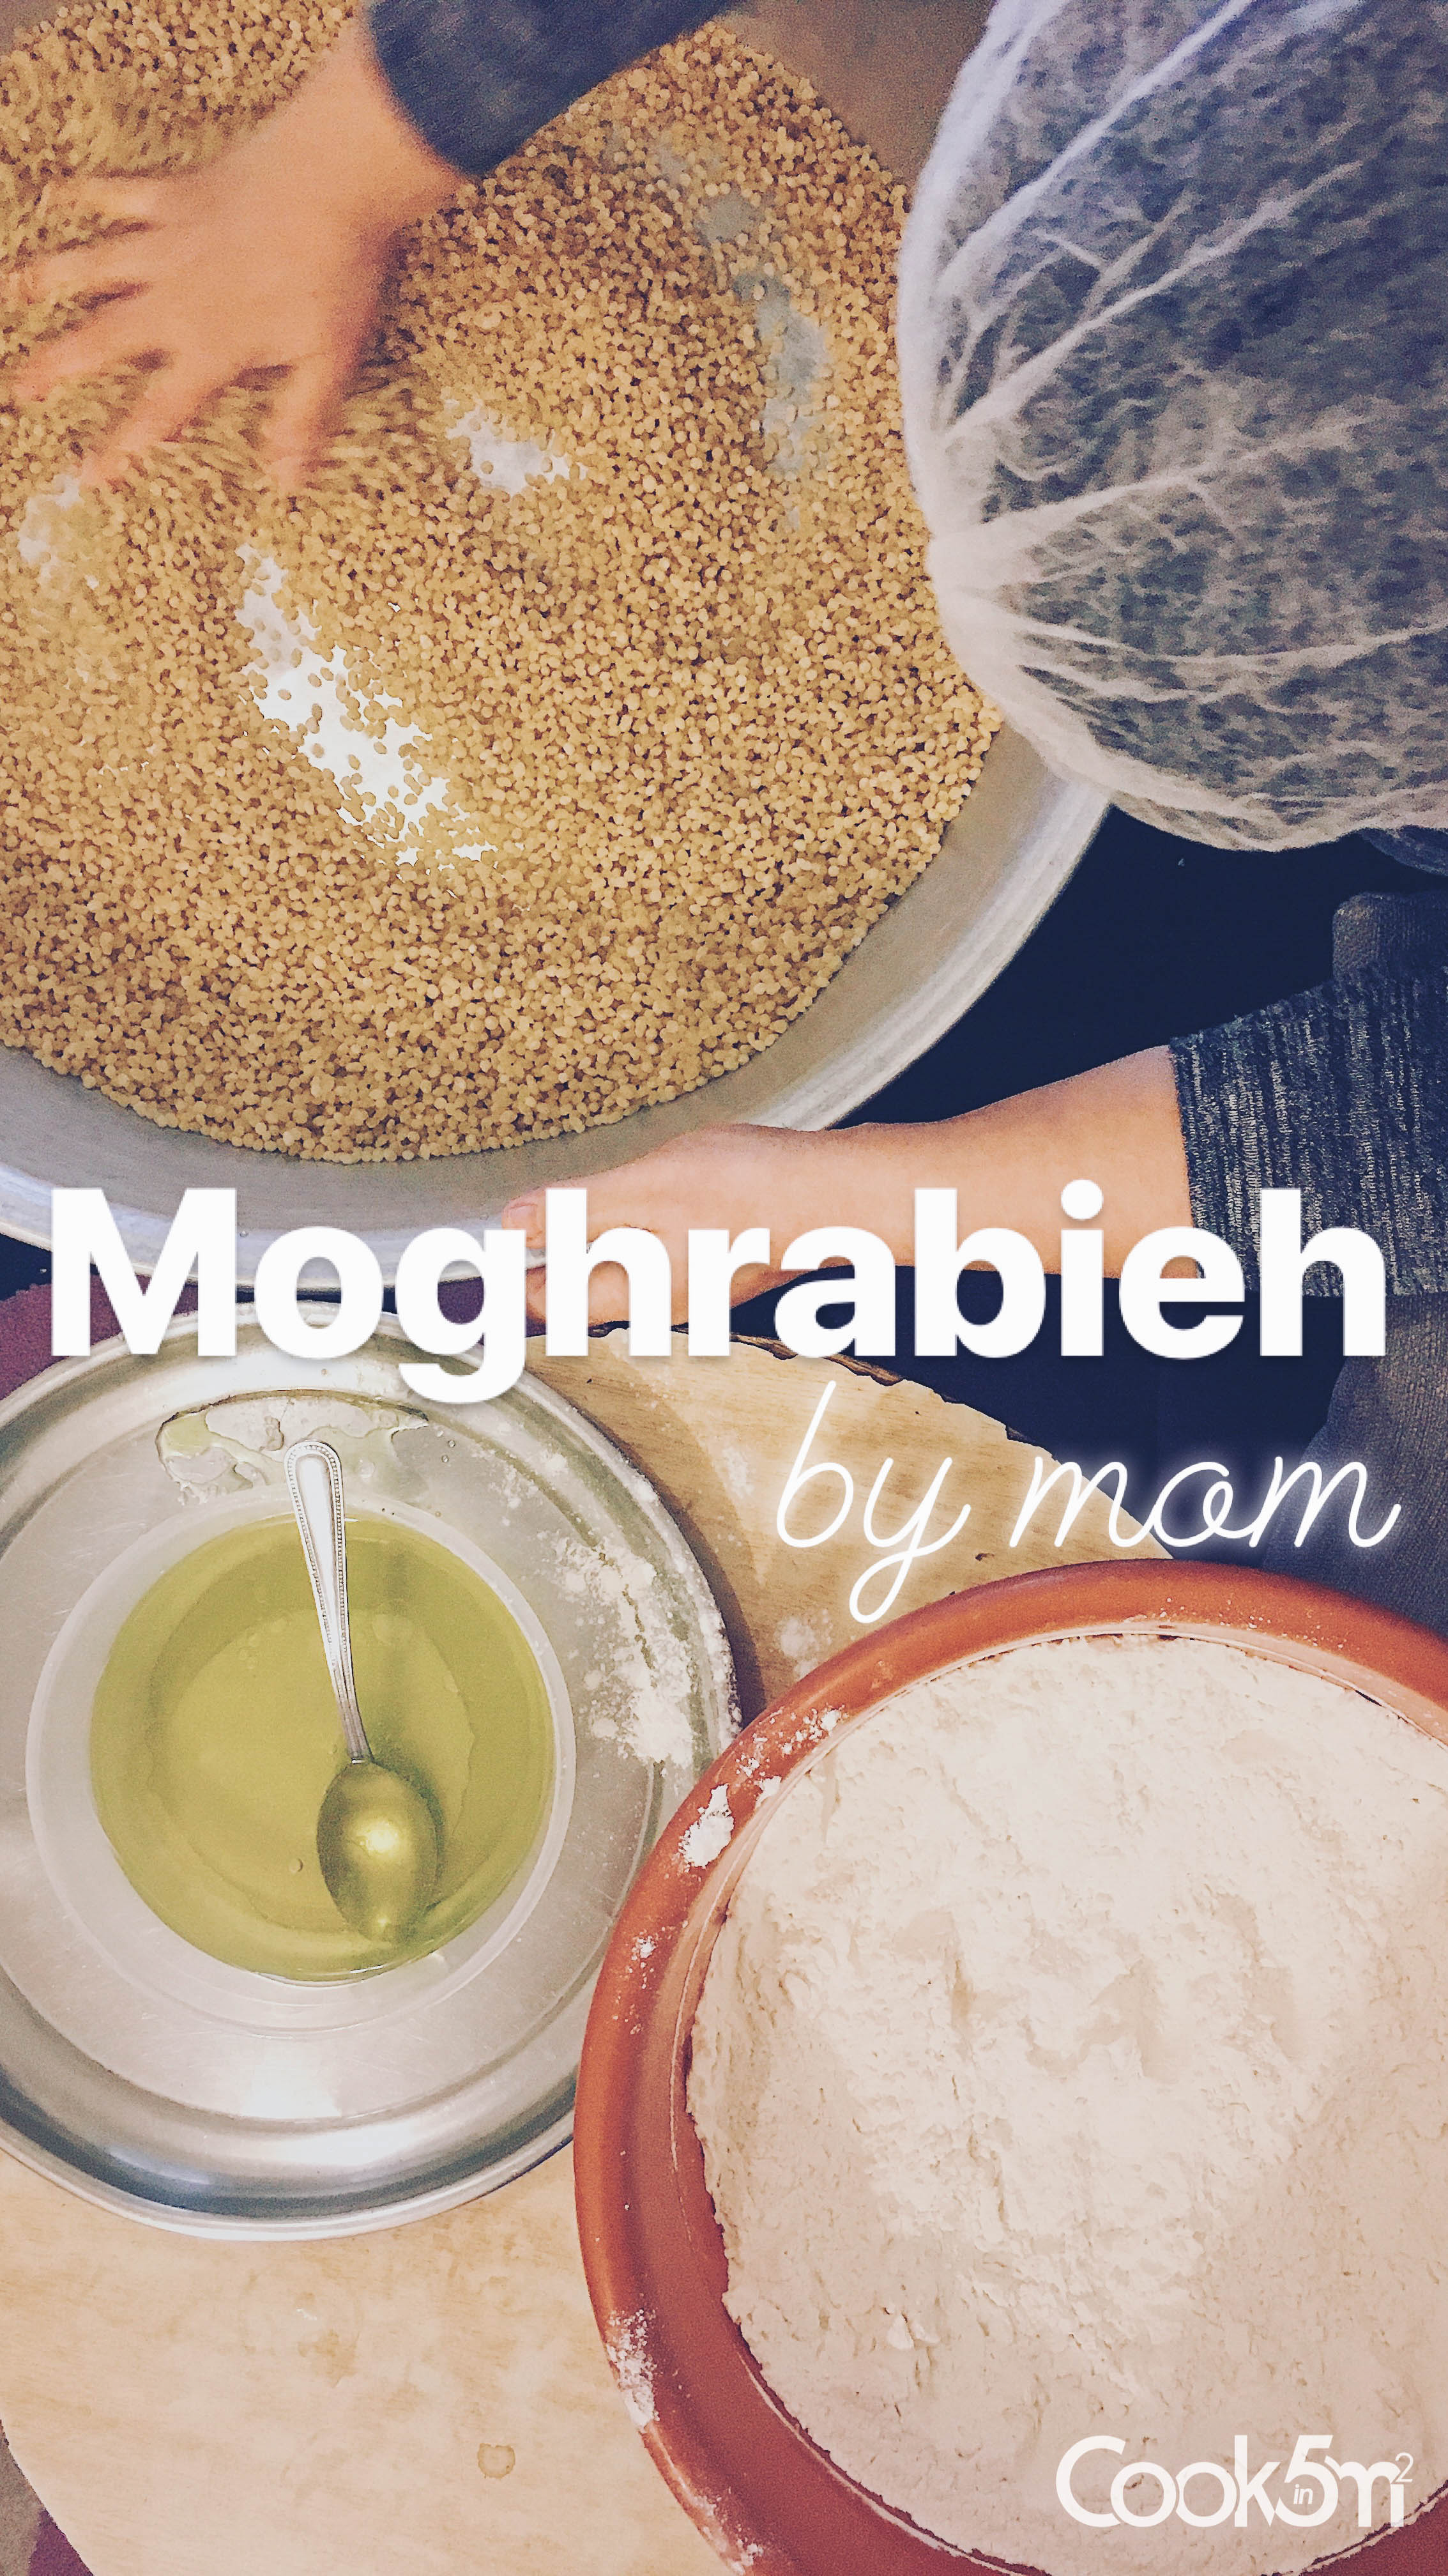 the spill 002-moghrabieh-cookin5m2